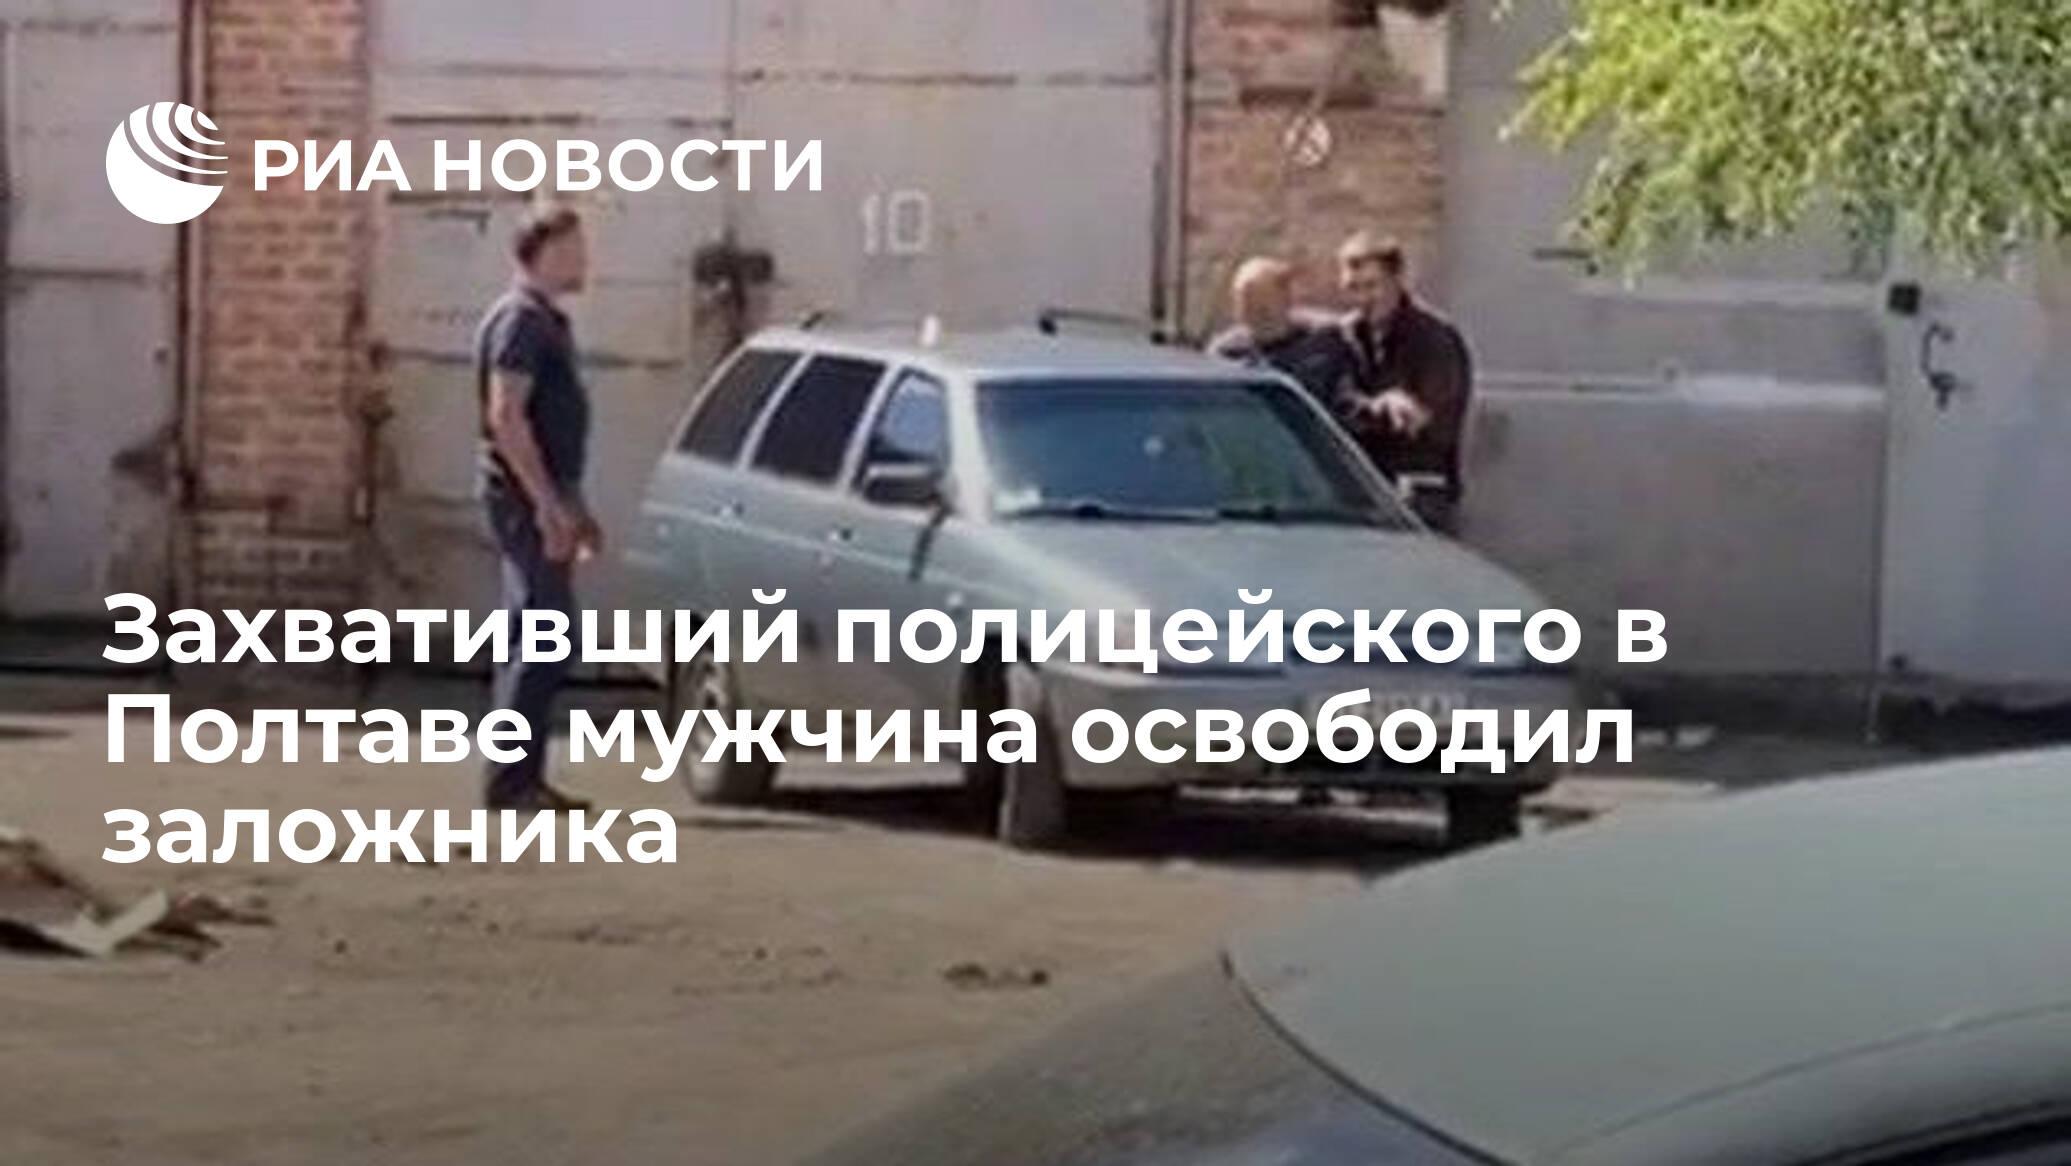 Захвативший полицейского в Полтаве мужчина освободил заложника